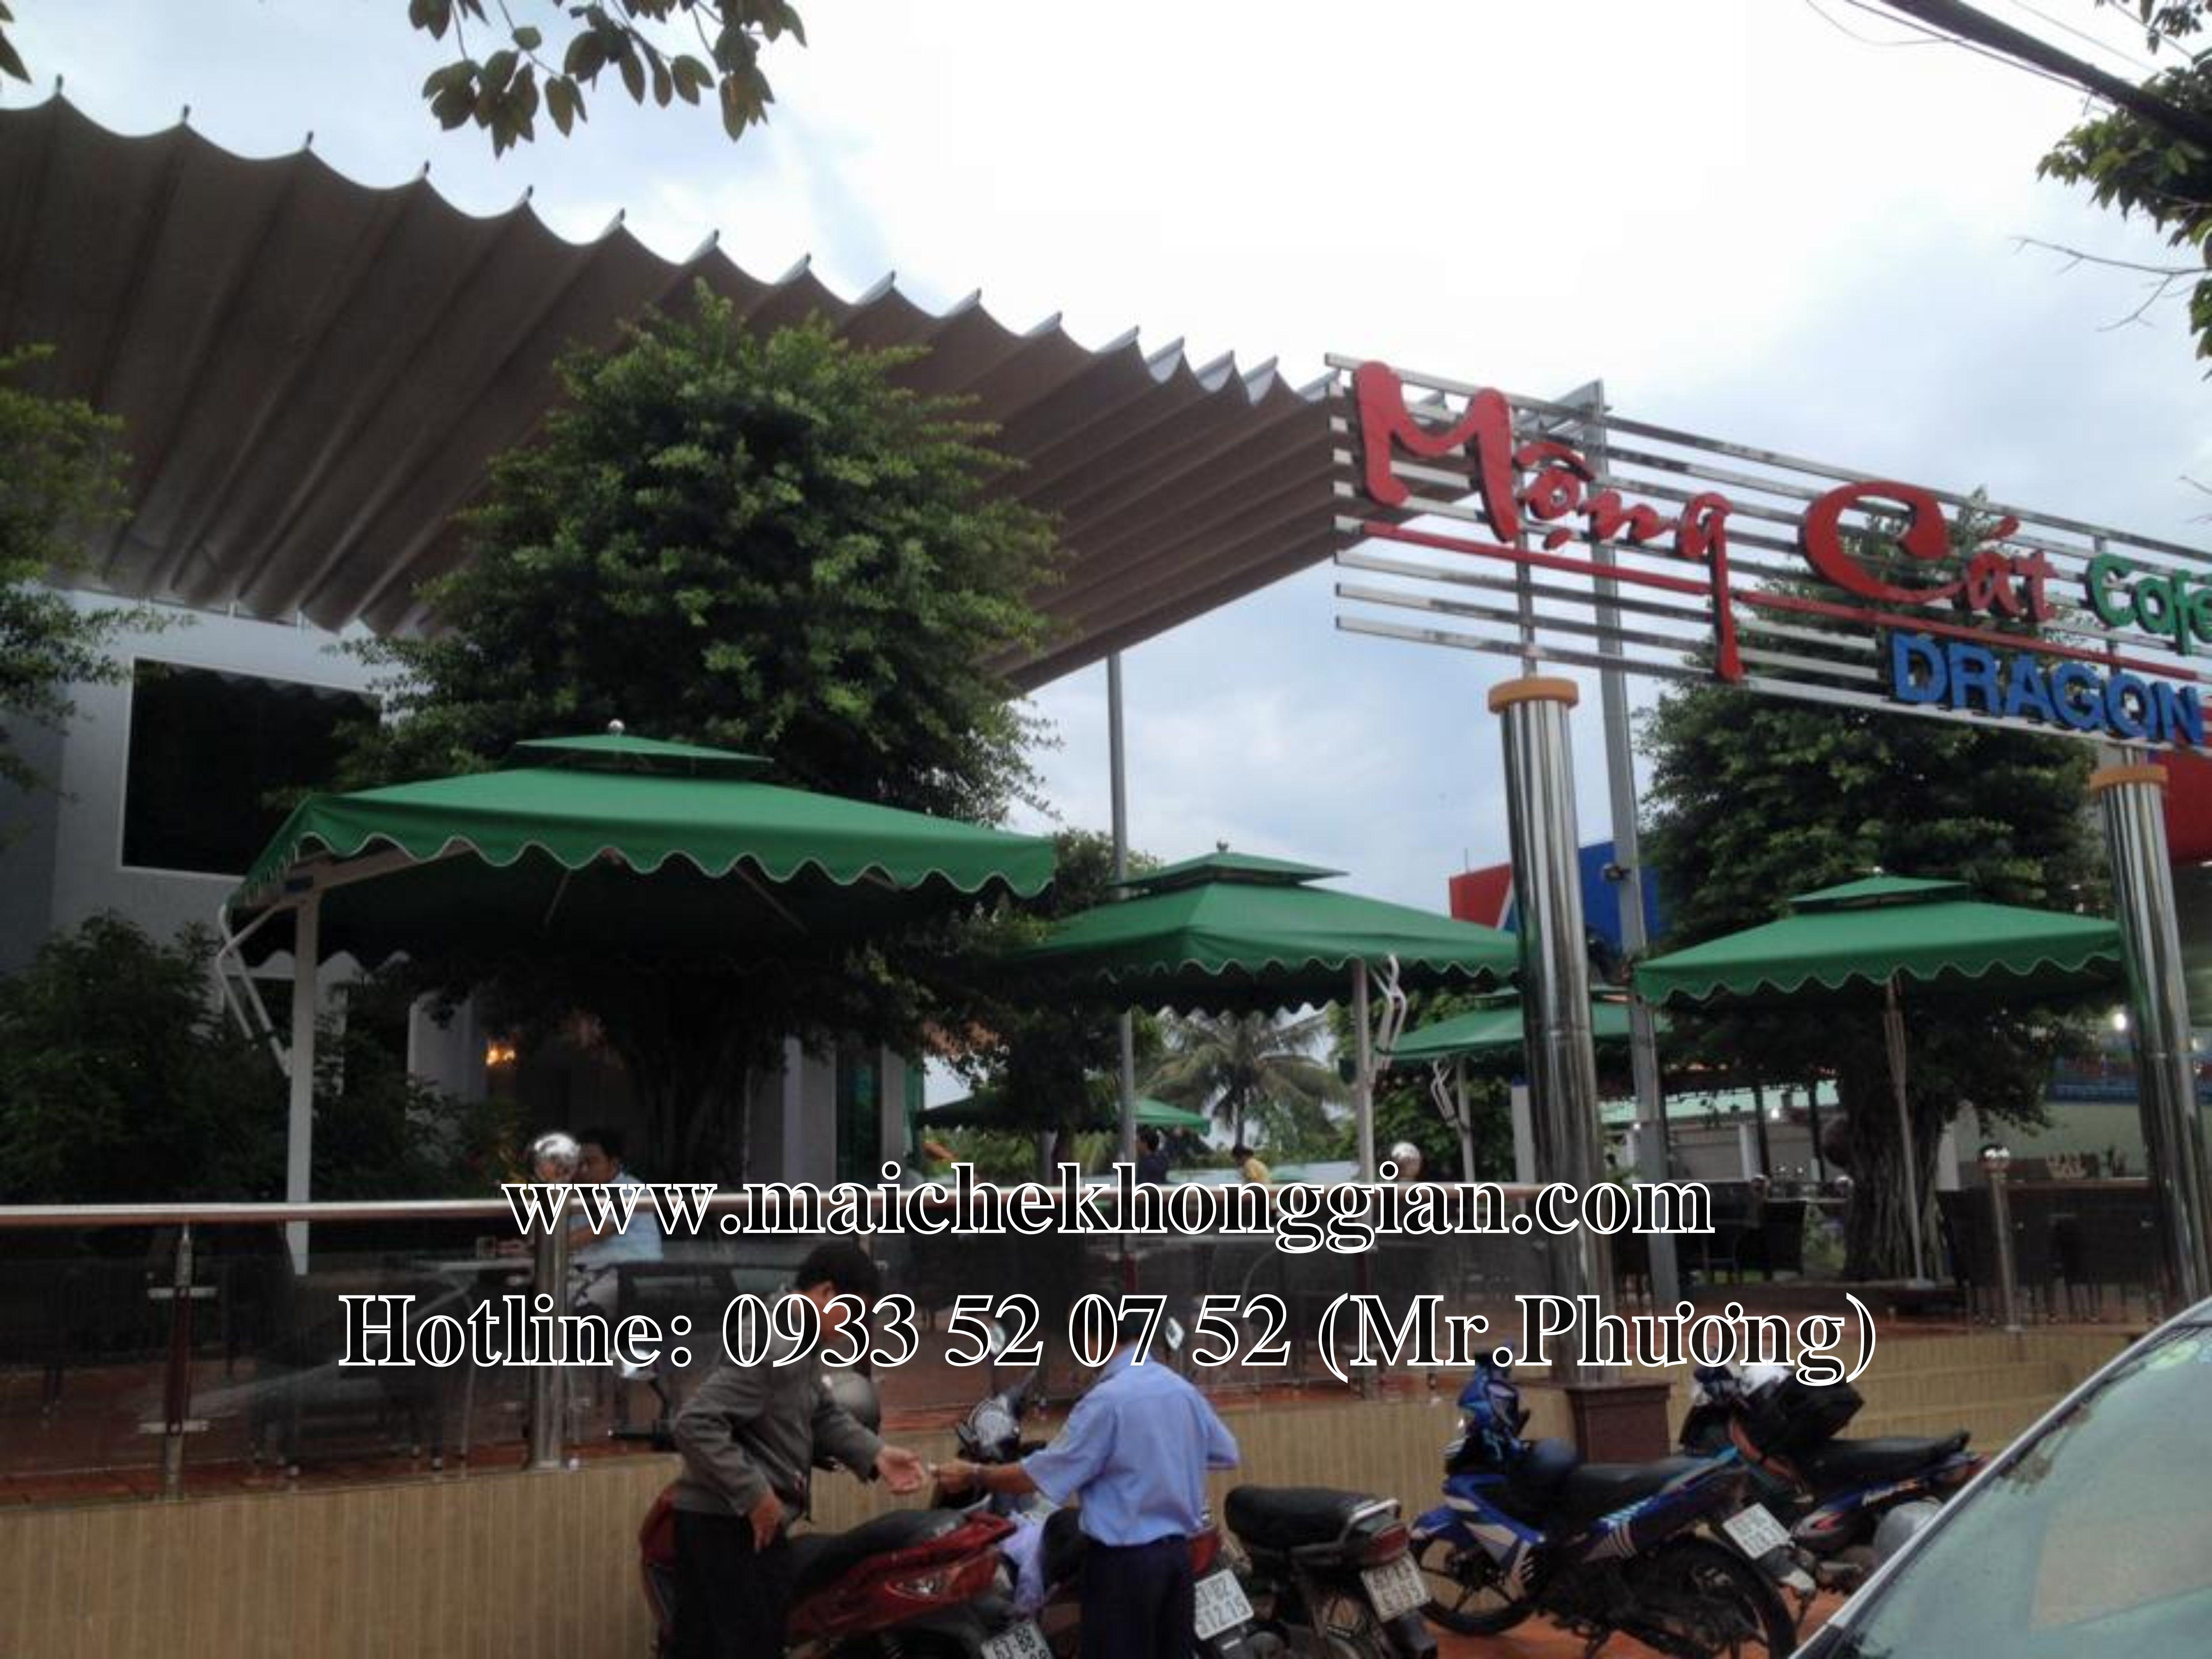 Mái xếp Quận 2 TP Hồ Chí Minh